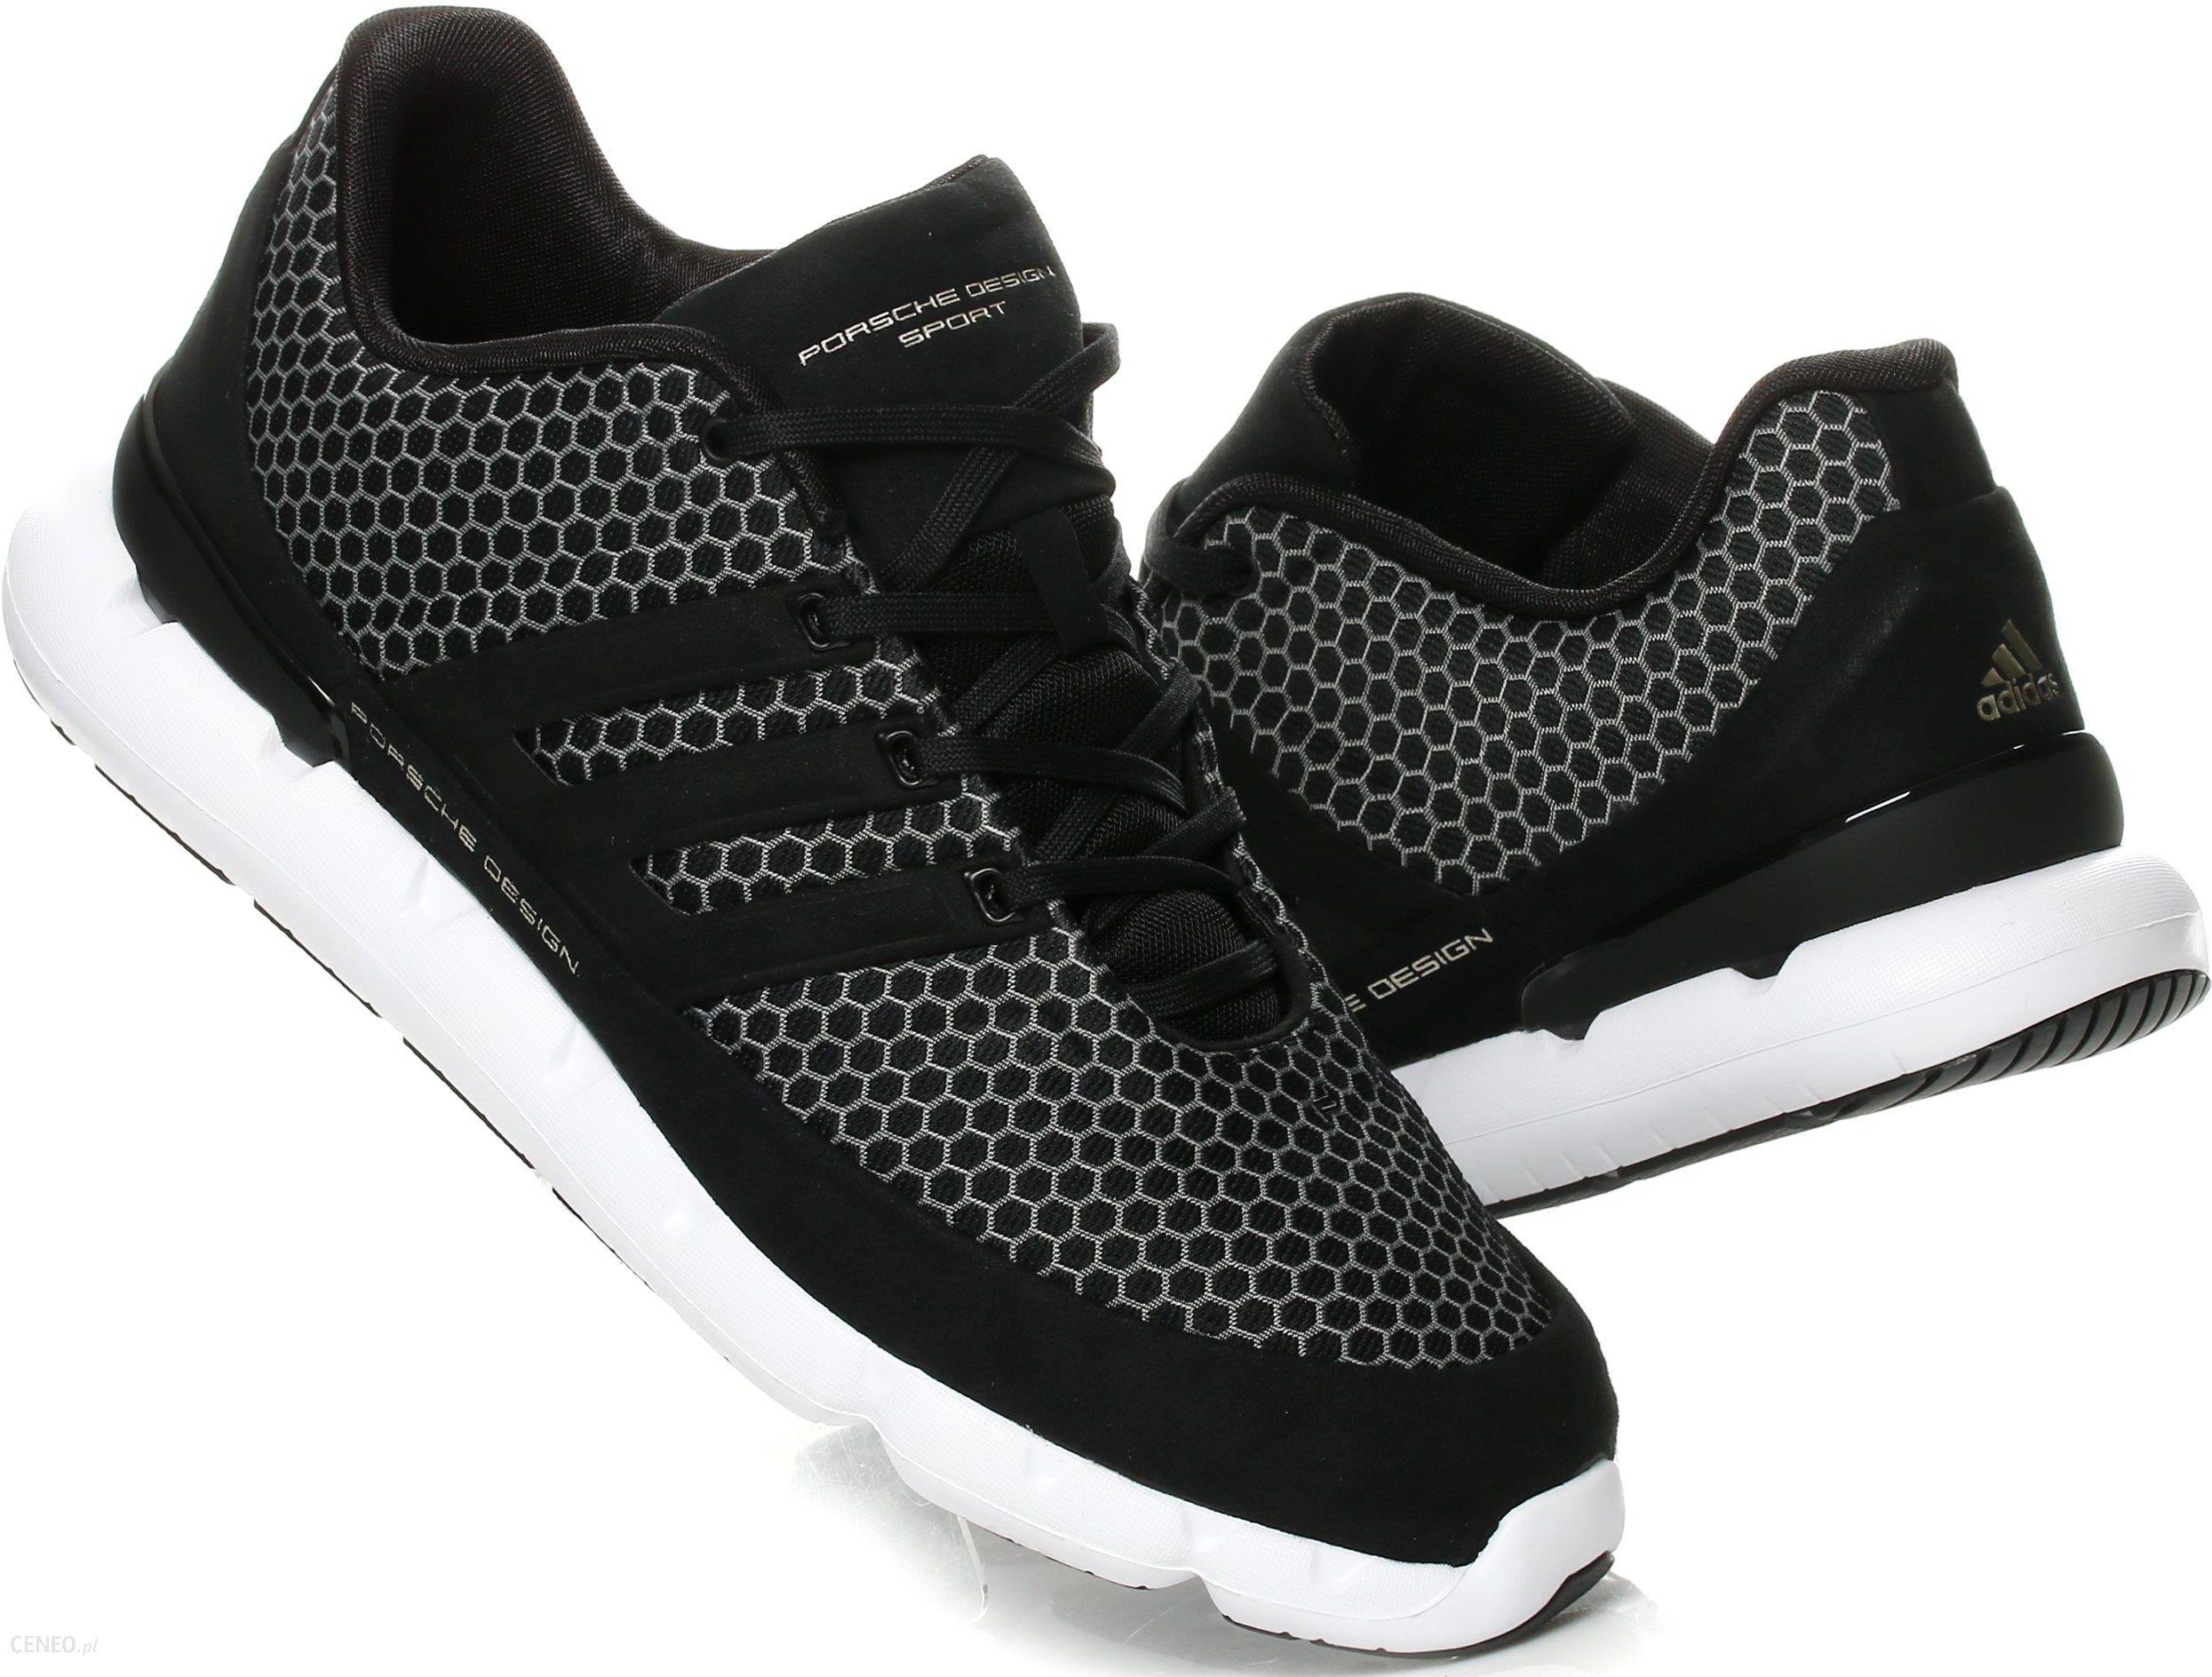 finest selection 7e2c2 682c0 switzerland men shoes adidas porsche design. on sale eee0e 95cbb  reduced  buty adidas ec bb5530 porsche design 43 1 3 nowo zdjcie 1 663cd 4df03